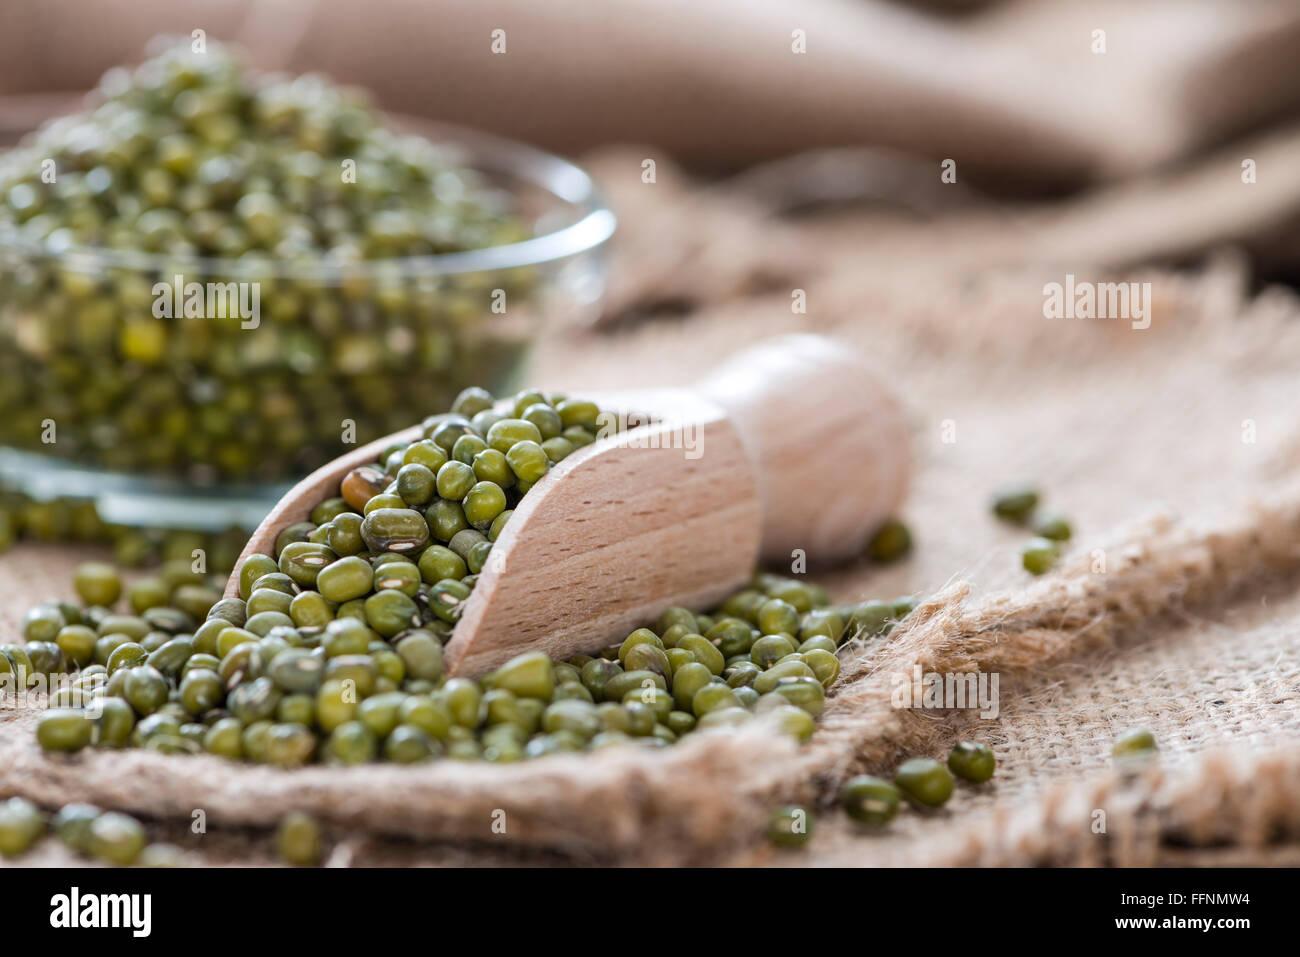 Porzione di essiccato fagioli mung (dettagliate di close-up shot) Immagini Stock